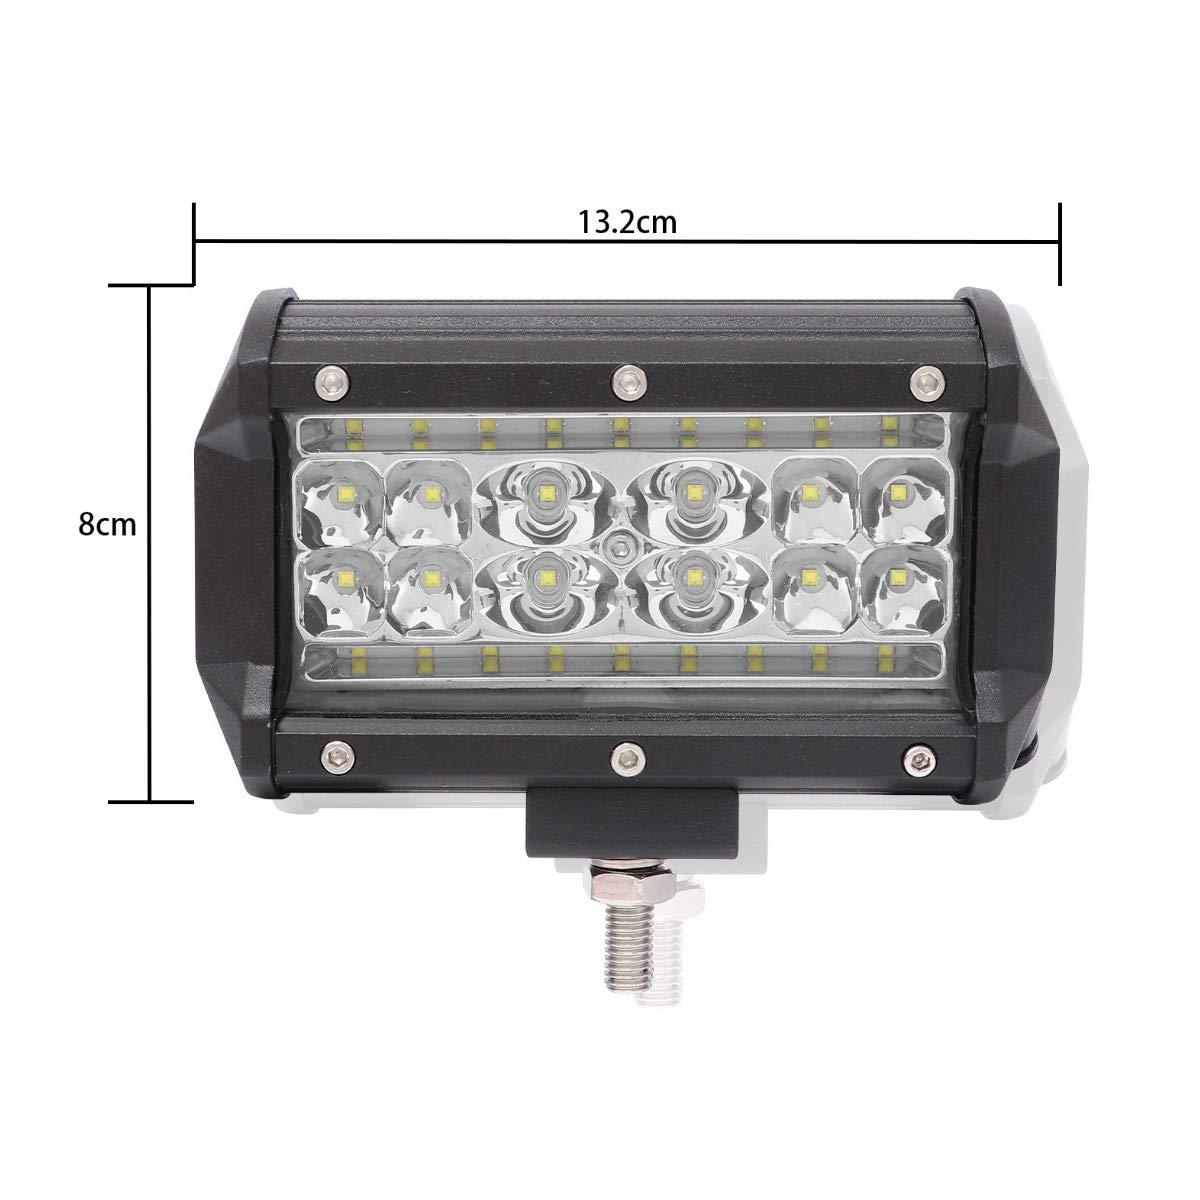 IP68 Waterproof Rate LED Light Bar 2Pcs 5 84W with 28pcs Superior LED Chips,LED Pods Fog Light for Trucks with Spot and Flood Light Maximum Illumination Range DKiigame